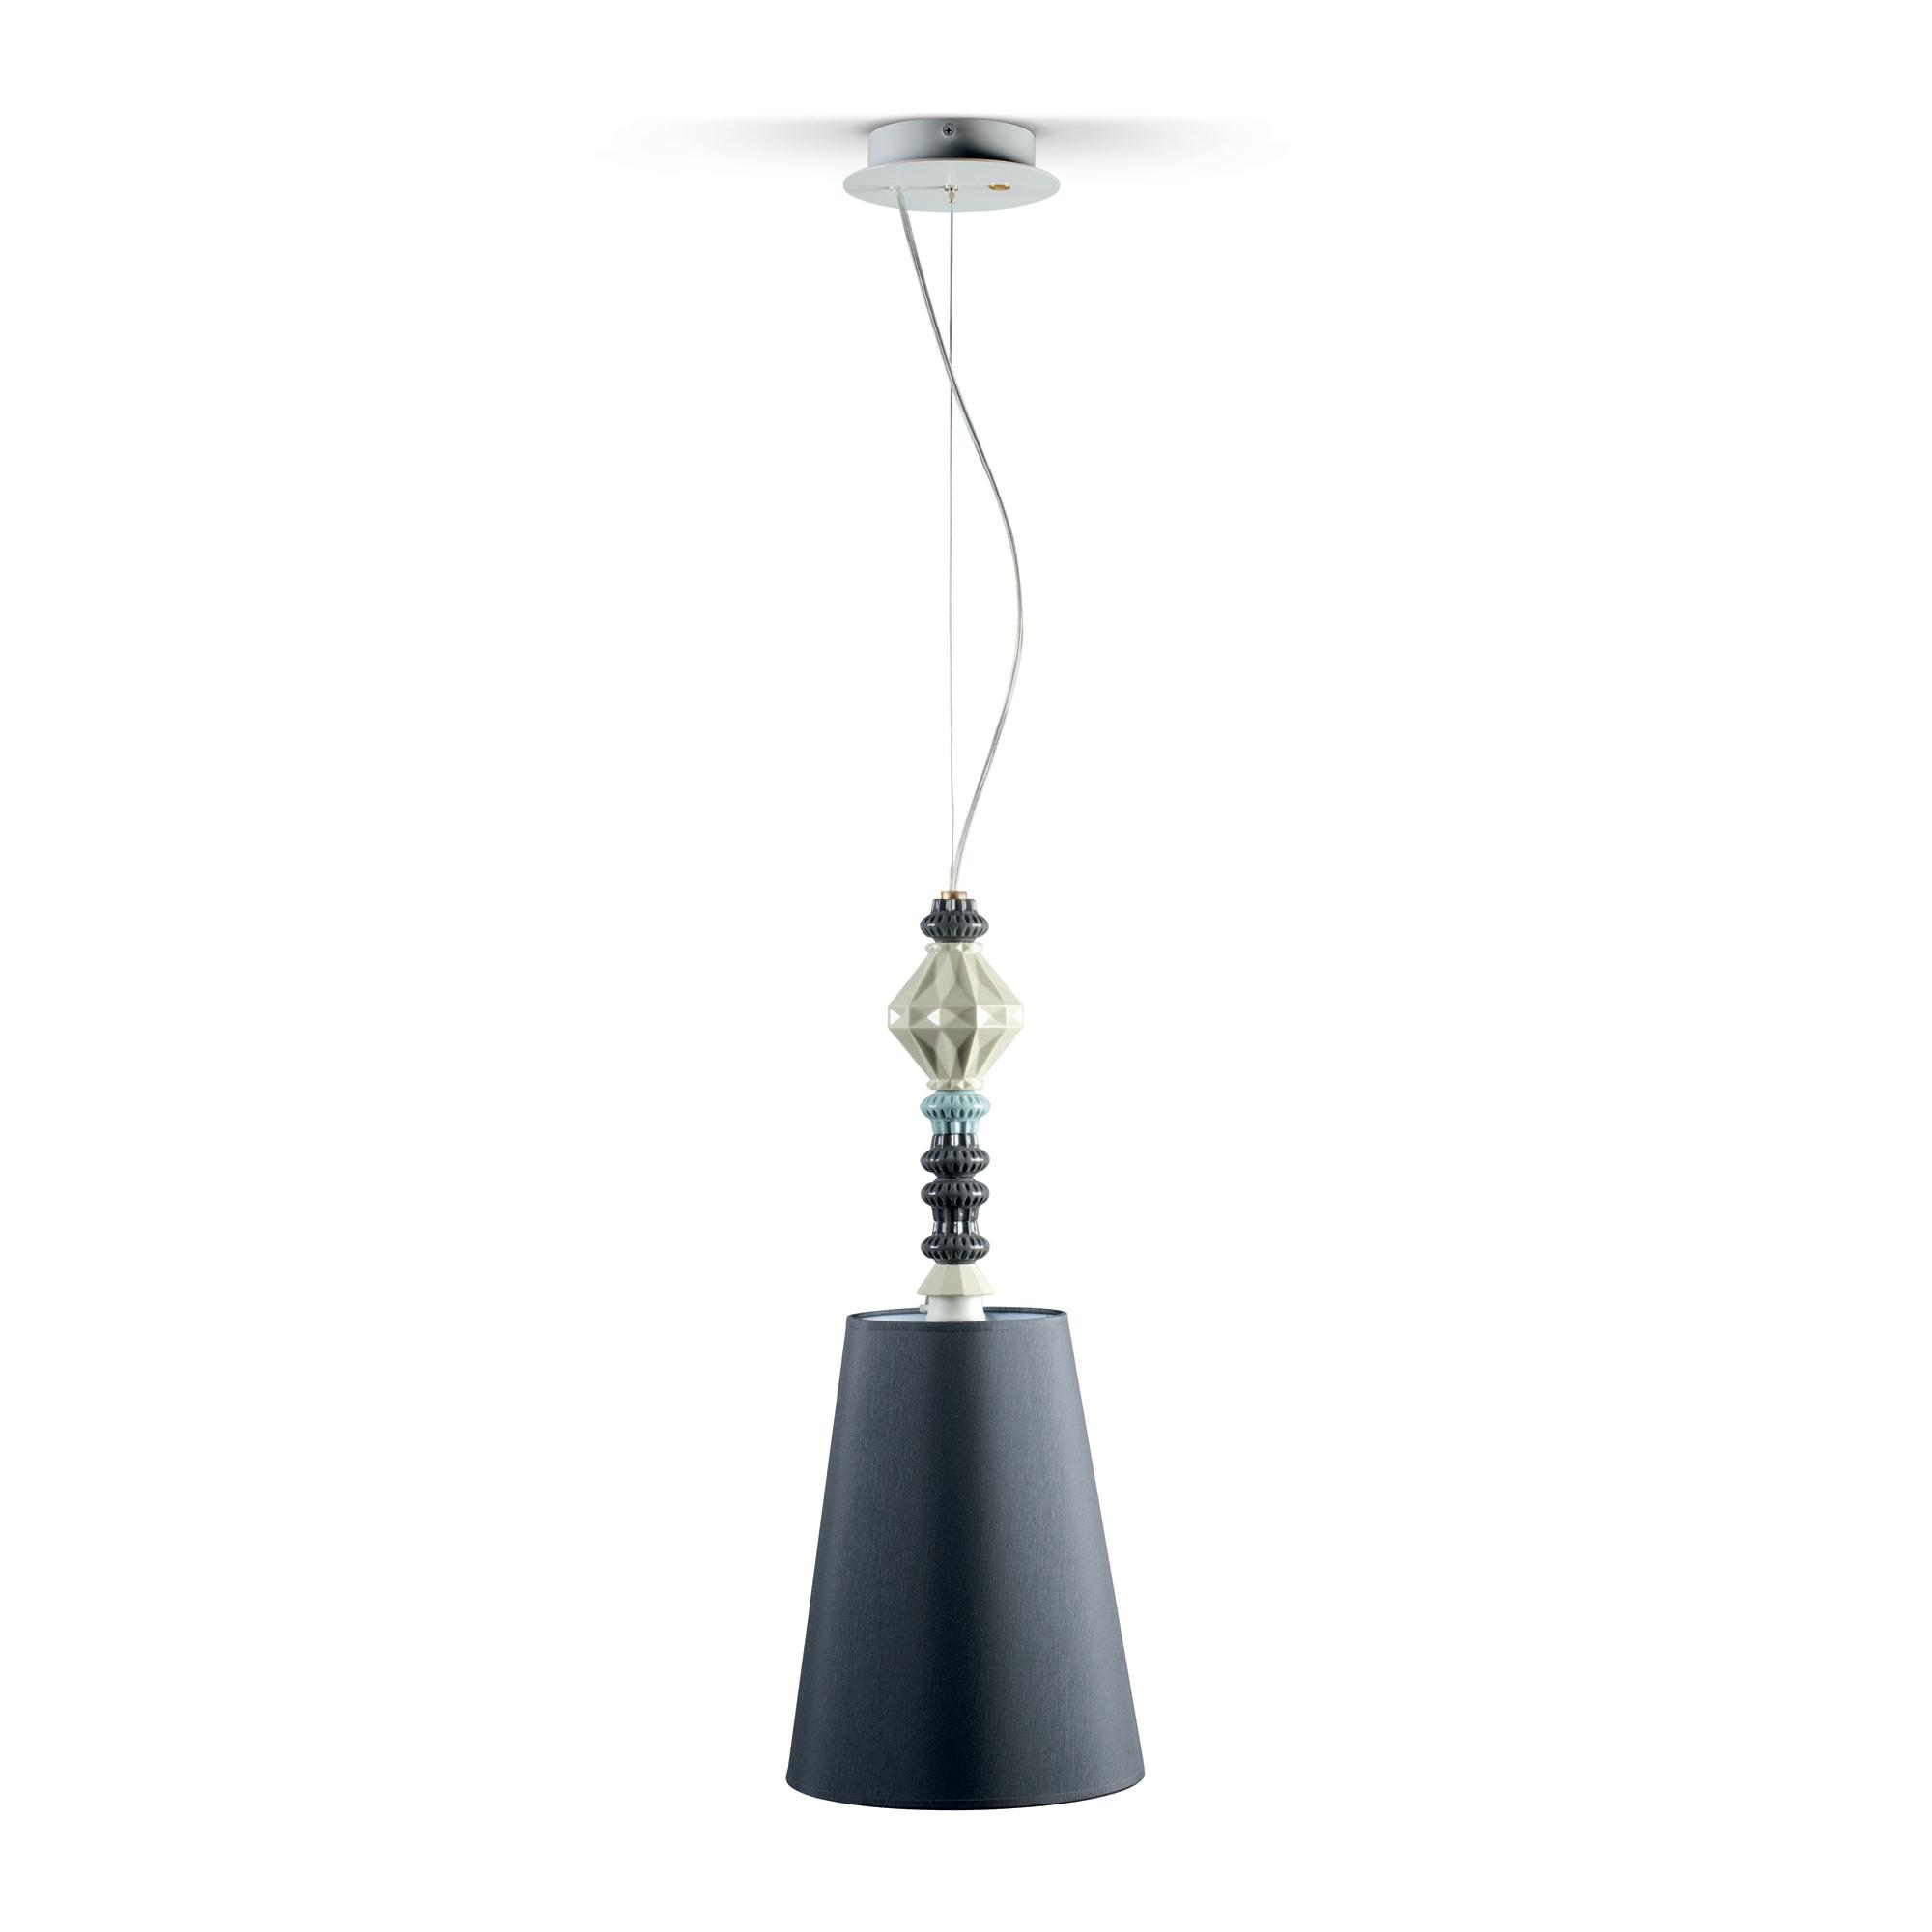 Pendant Lamp I - Black (Belle de Nuit Collection) 01023381 - Lladro Lighting